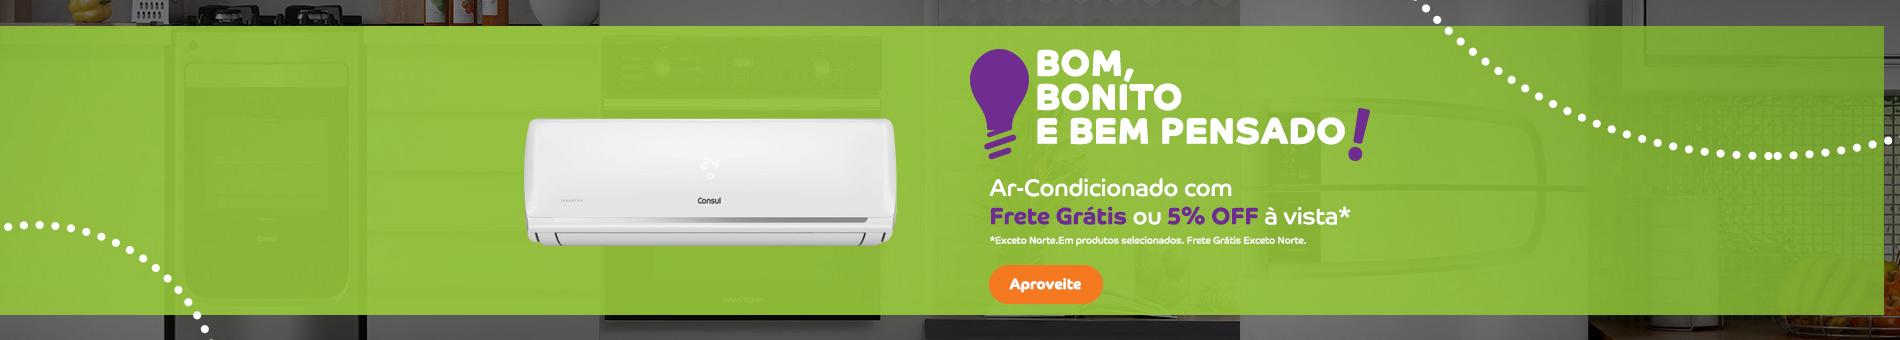 Promoção Interna - 1286 - bombonito_ac-CBF12DB-frete_20012017_home2 - ac-CBF12DB-frete - 2